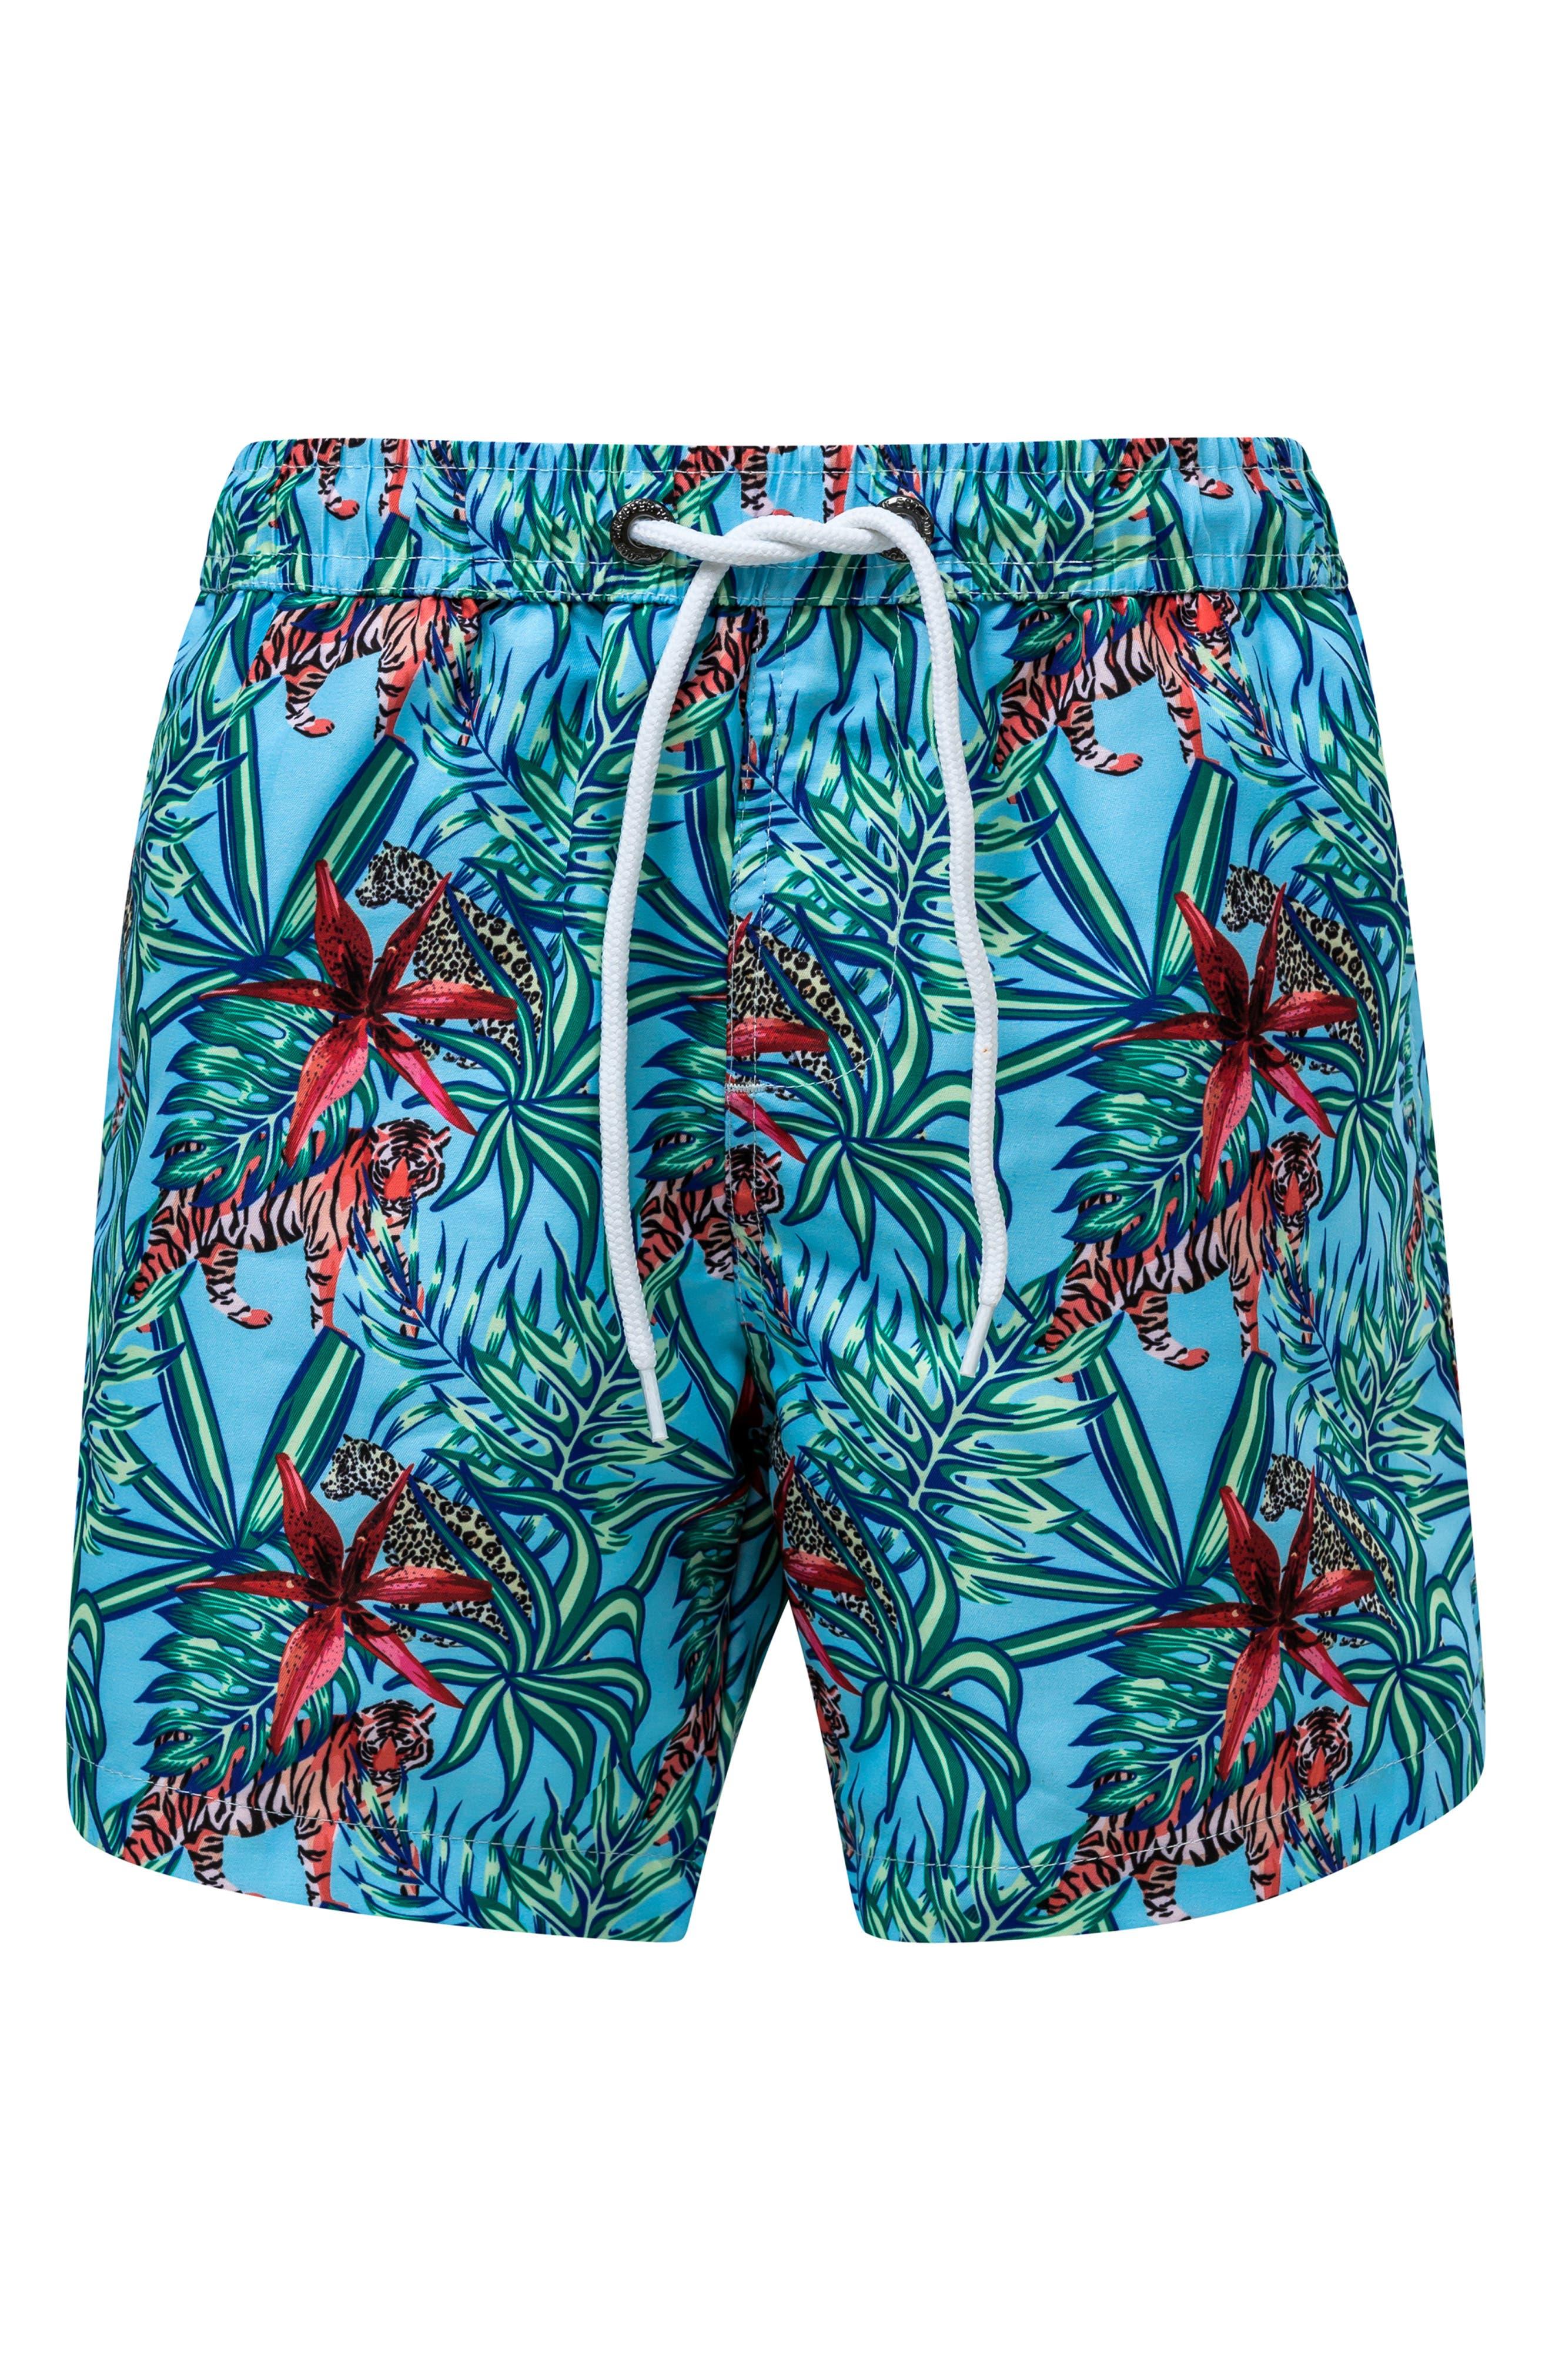 Jungle Fever Board Shorts,                             Main thumbnail 1, color,                             OPEN BLUE